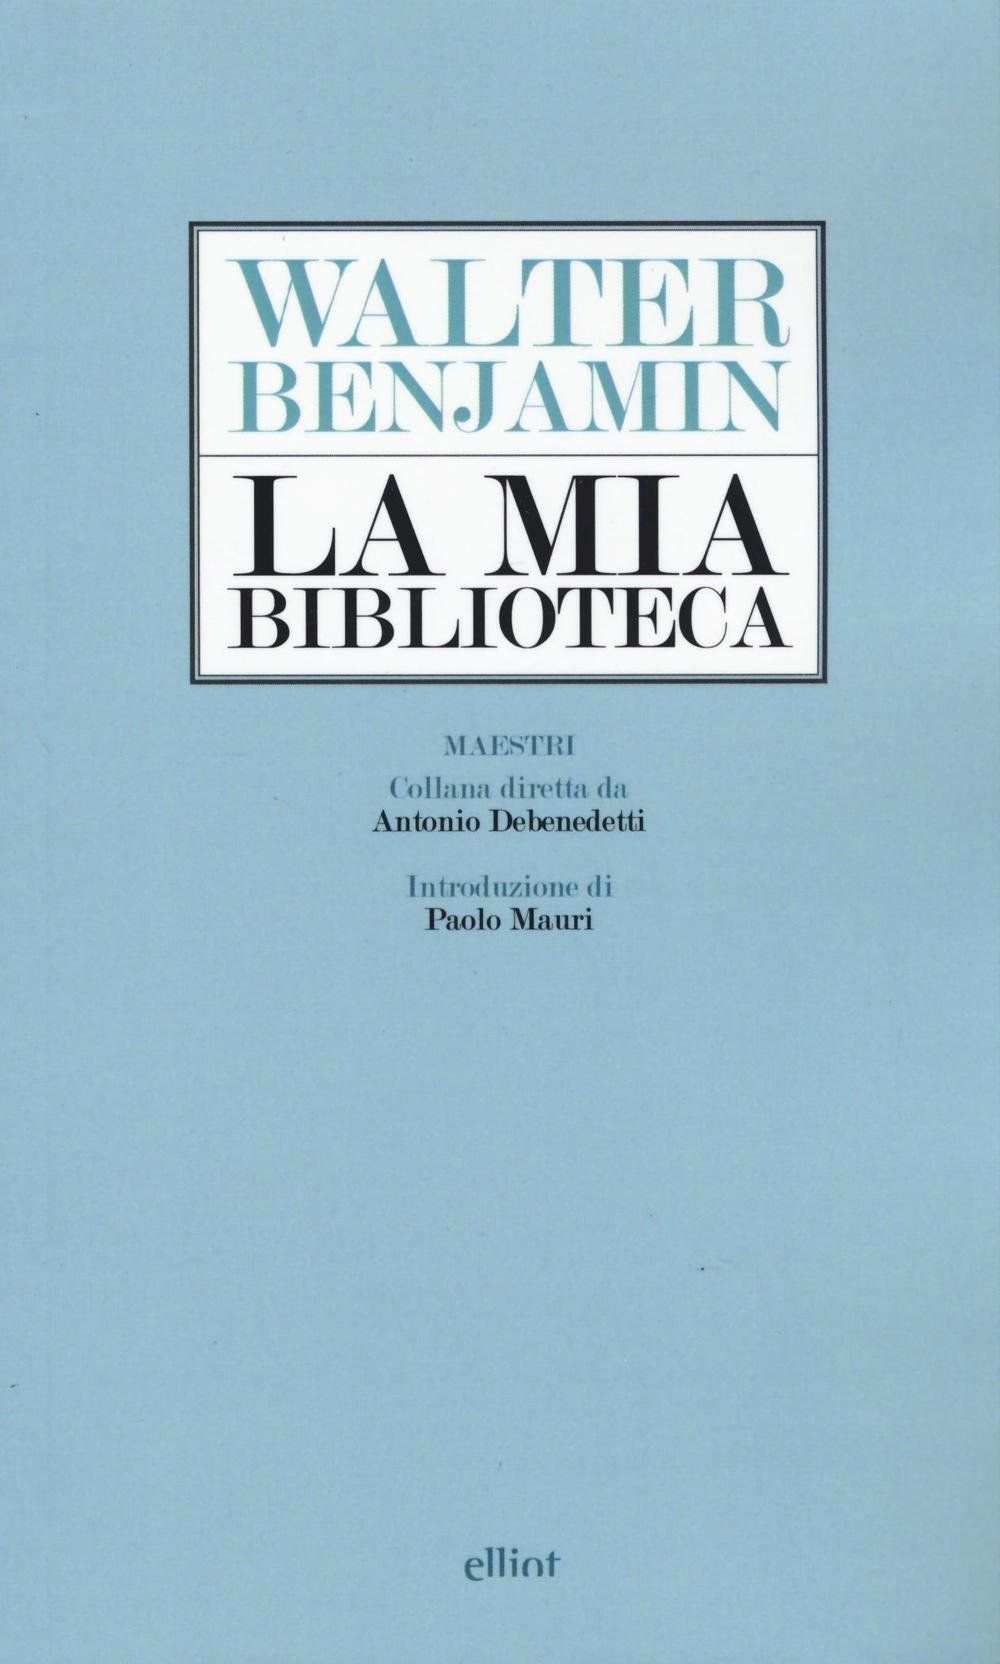 """La mia biblioteca"" di Walter Benjamin, e che biblioteca!"